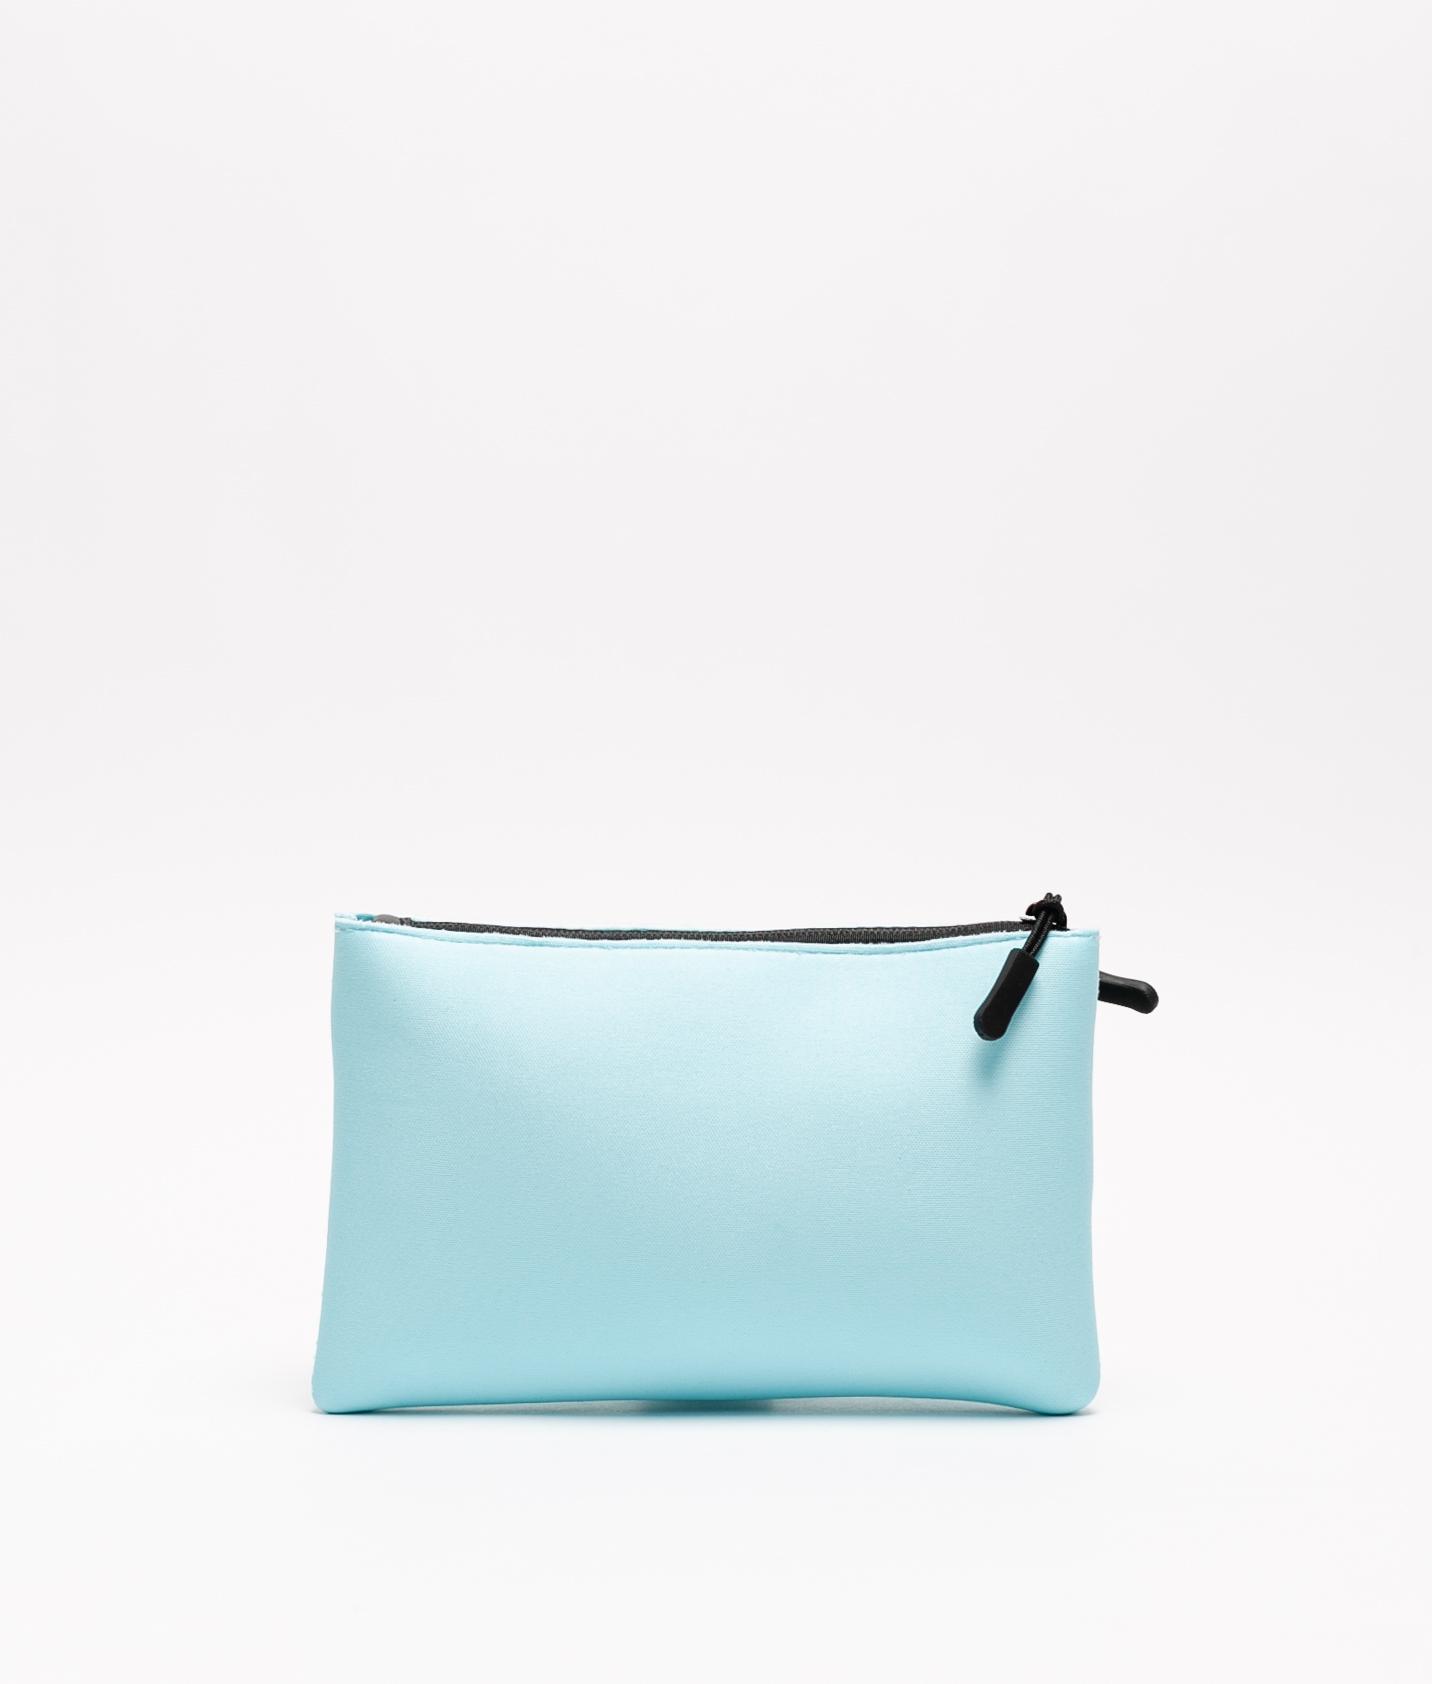 neoprene purse - light blue